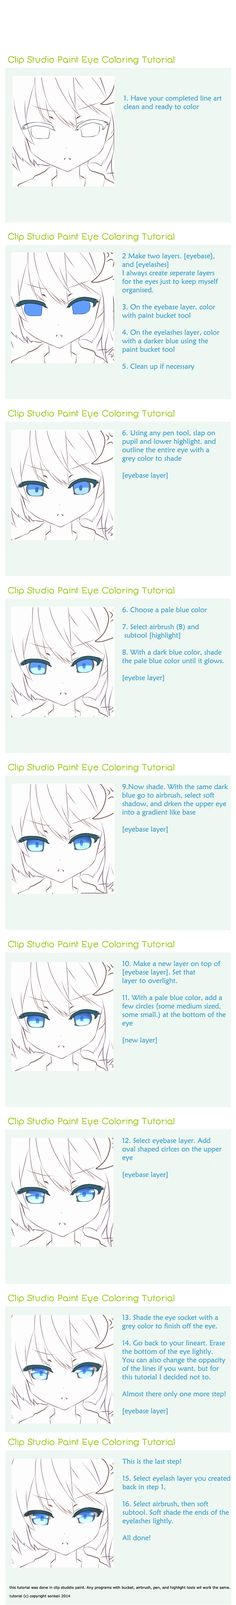 Clip Studio Paint Eye Tutorial by sonkeii.deviantart.com on @DeviantArt